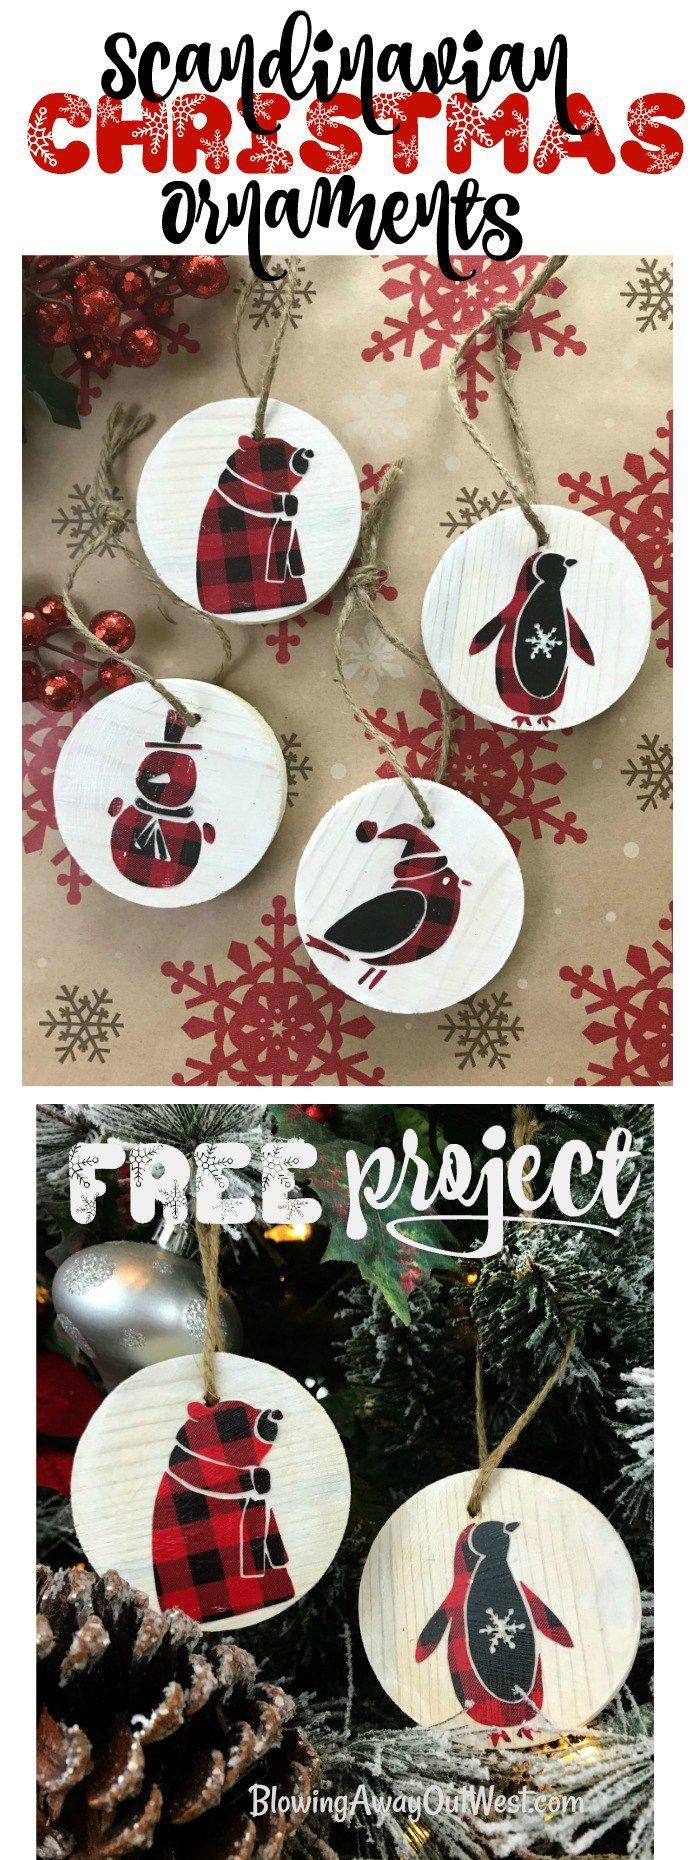 Scandinavian Wood Ornaments : Buffalo Check Ornaments   blowingawayoutwes... - D...